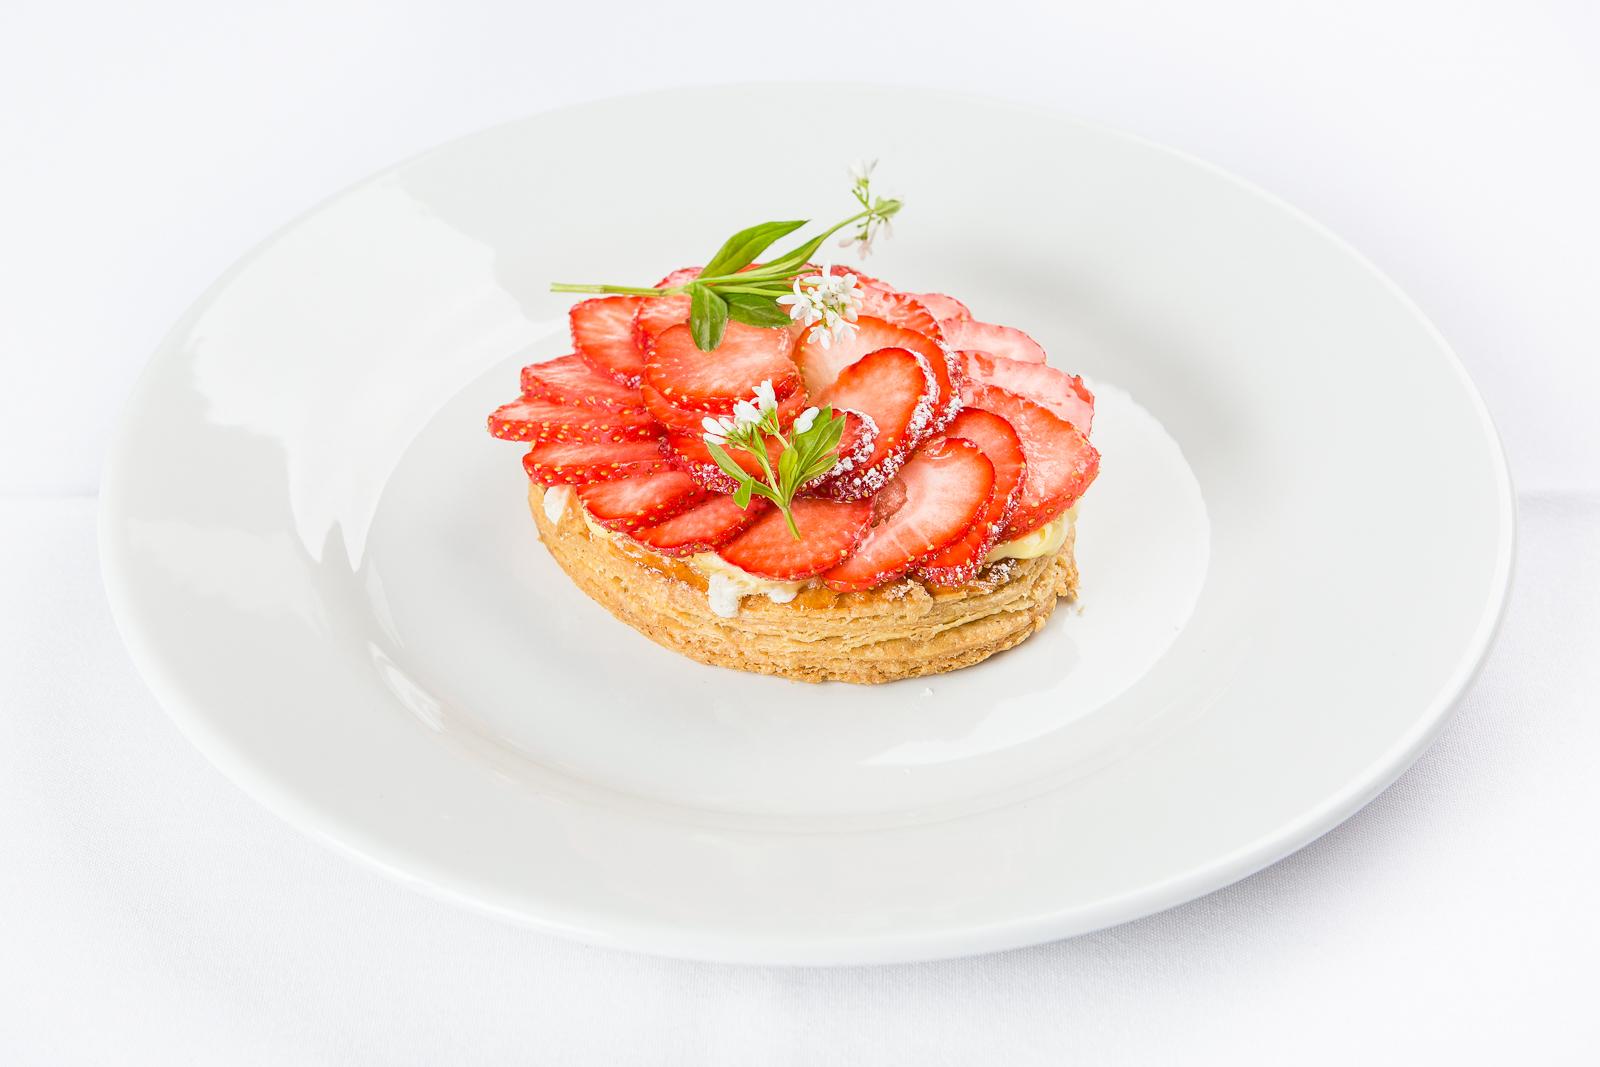 Neil Forbes Cafe St Honoré strawberry tart WEB 2.jpg